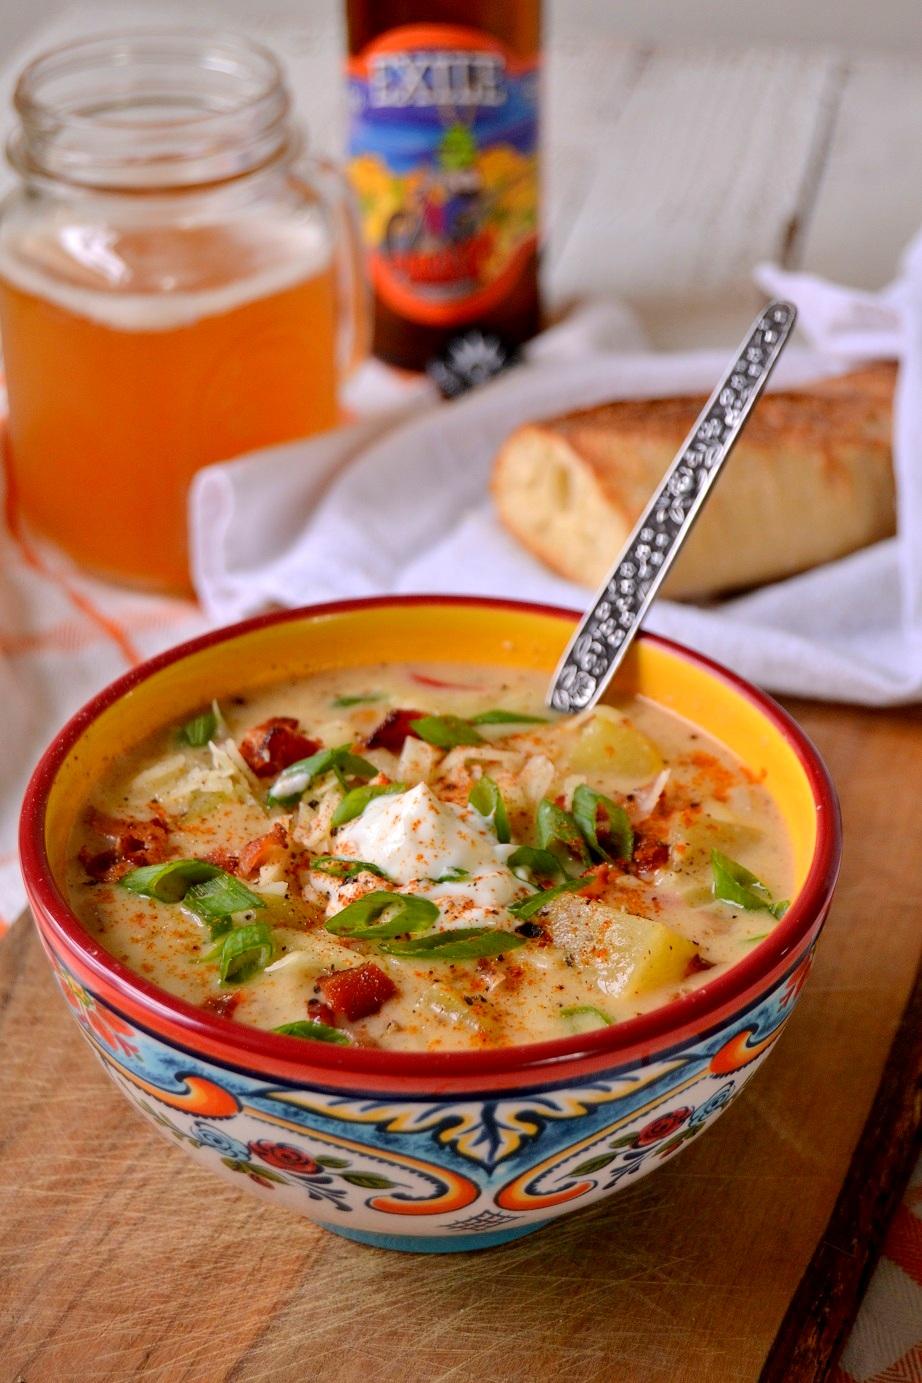 Loaded Baked Potato IPA Soup